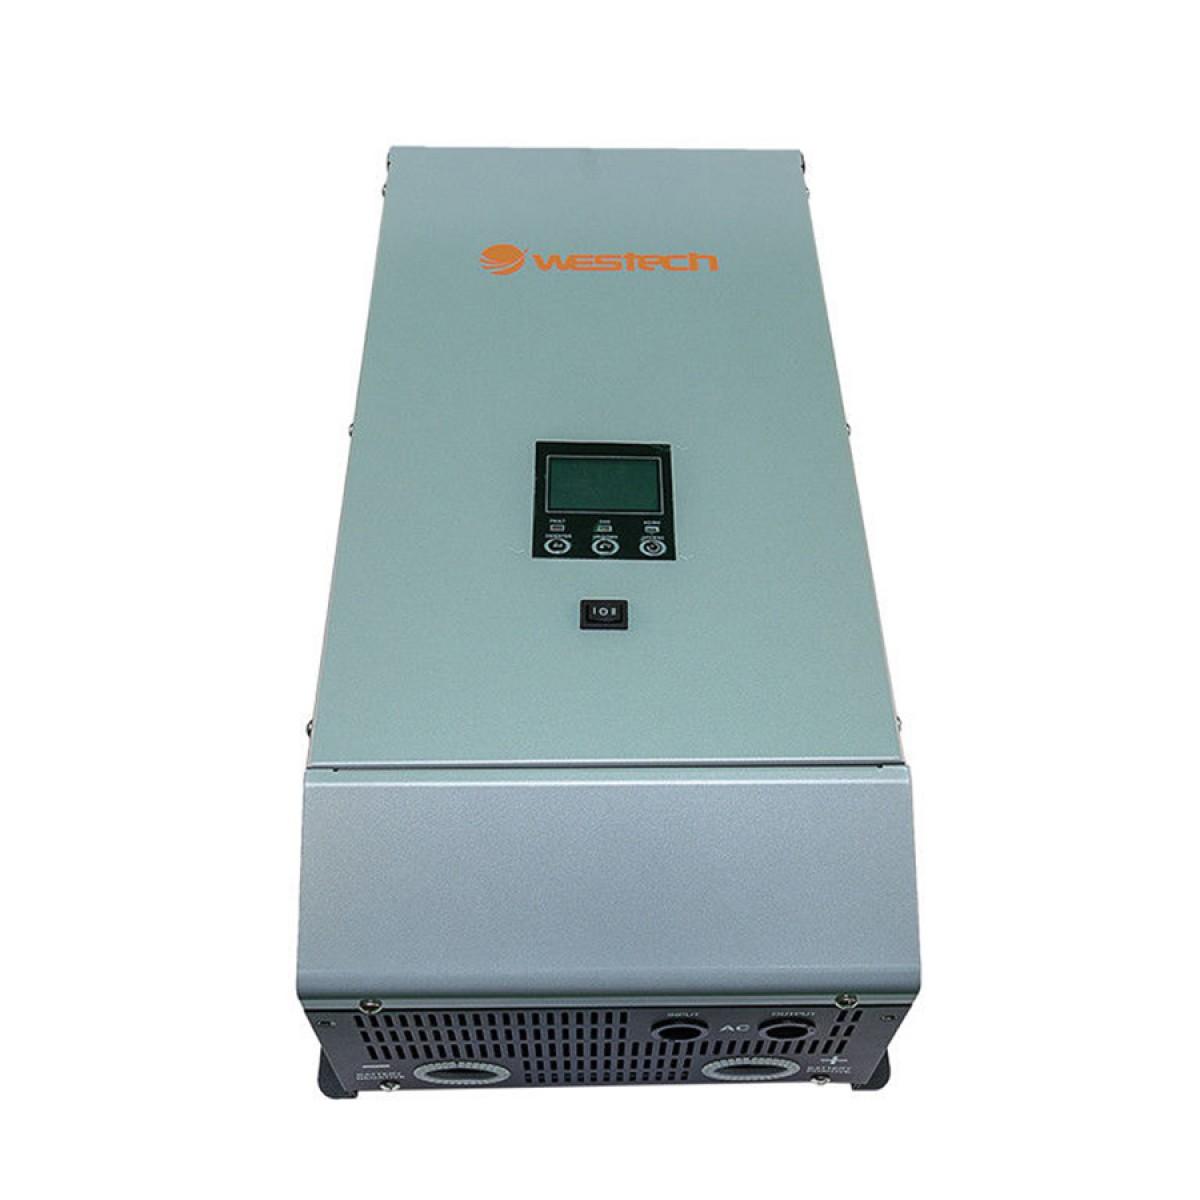 Inverter Καθαρού Ημιτόνου WESTECH Combi 12V / 3000W